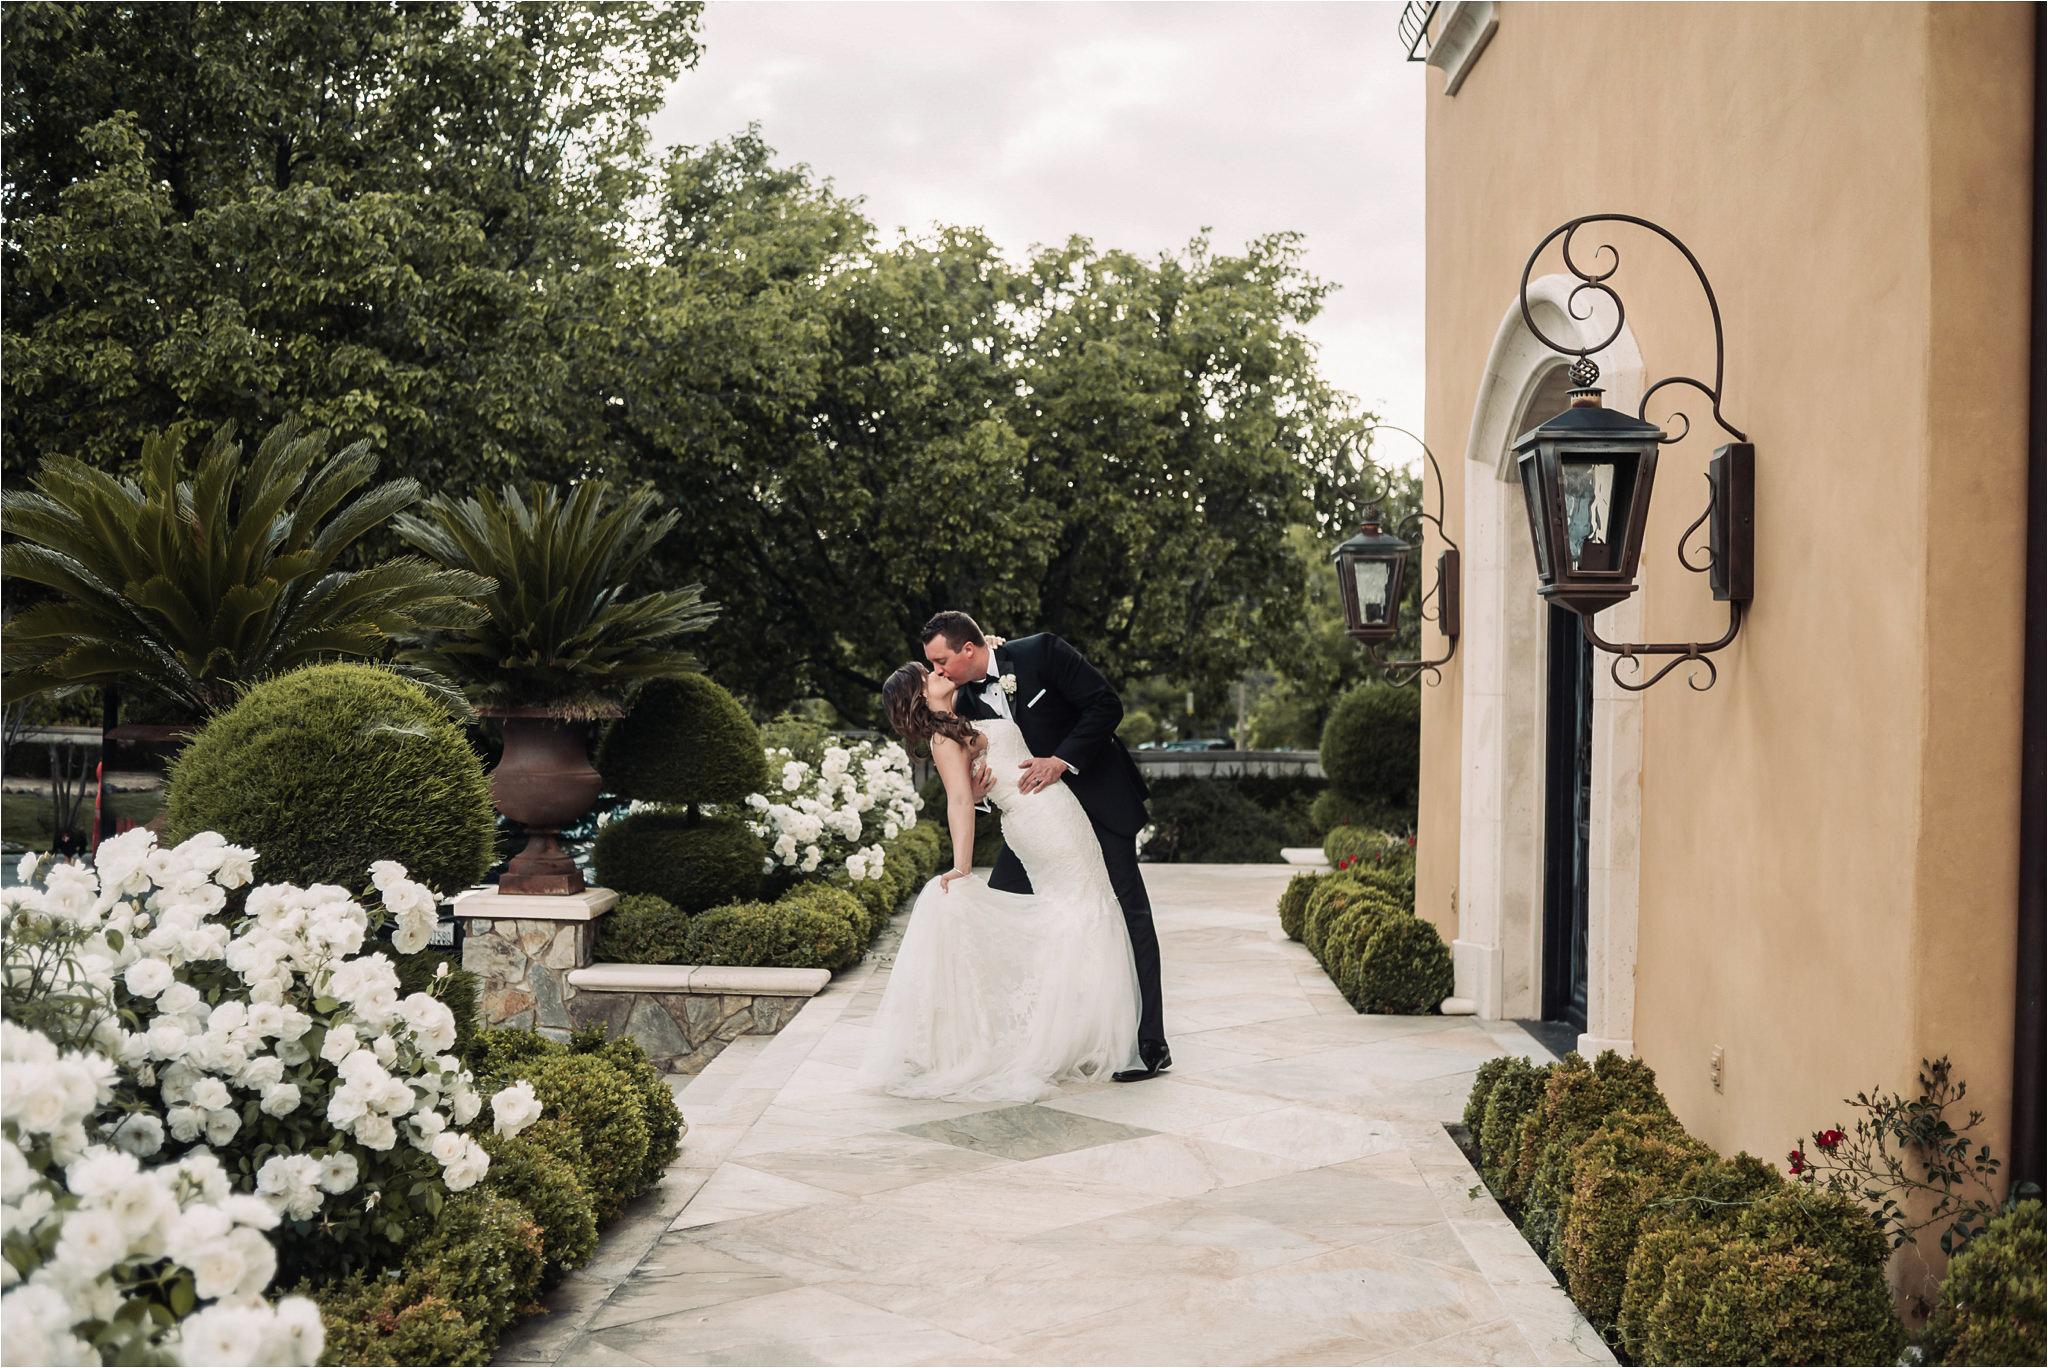 jessica-roman-photography-arden hills wedding photograpger-sacramento-boise-37.jpg